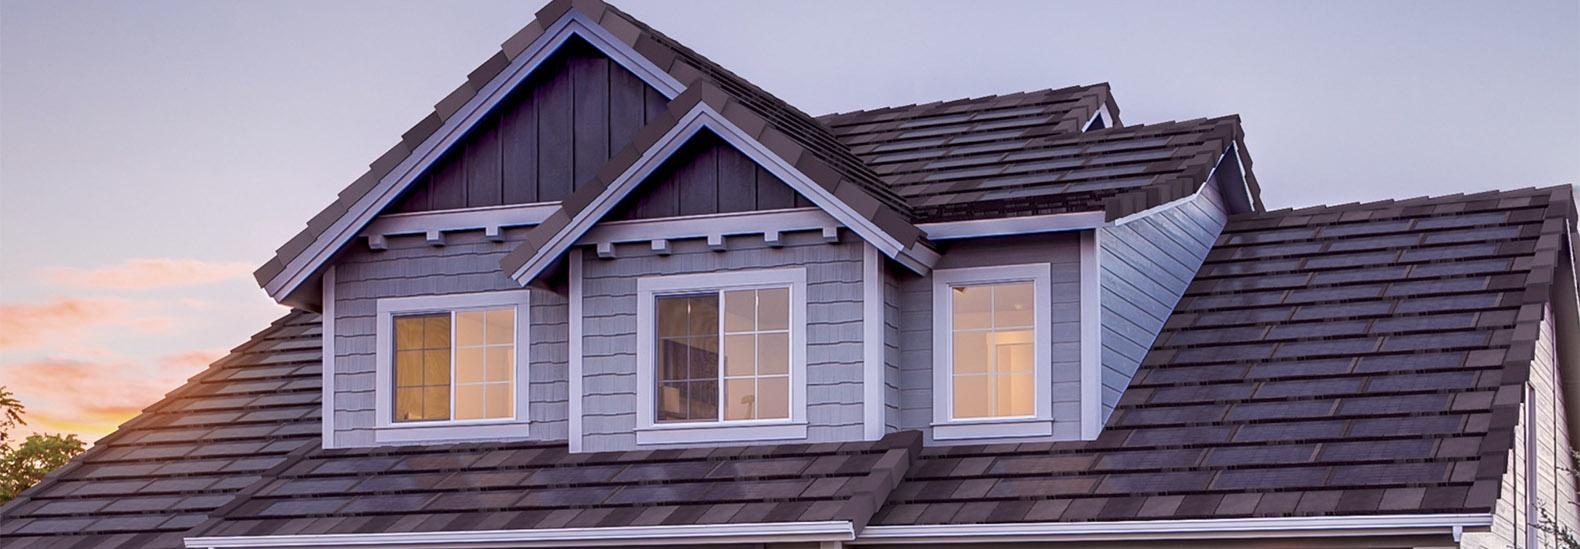 Evo Roof Home - Evo Roof Technologies